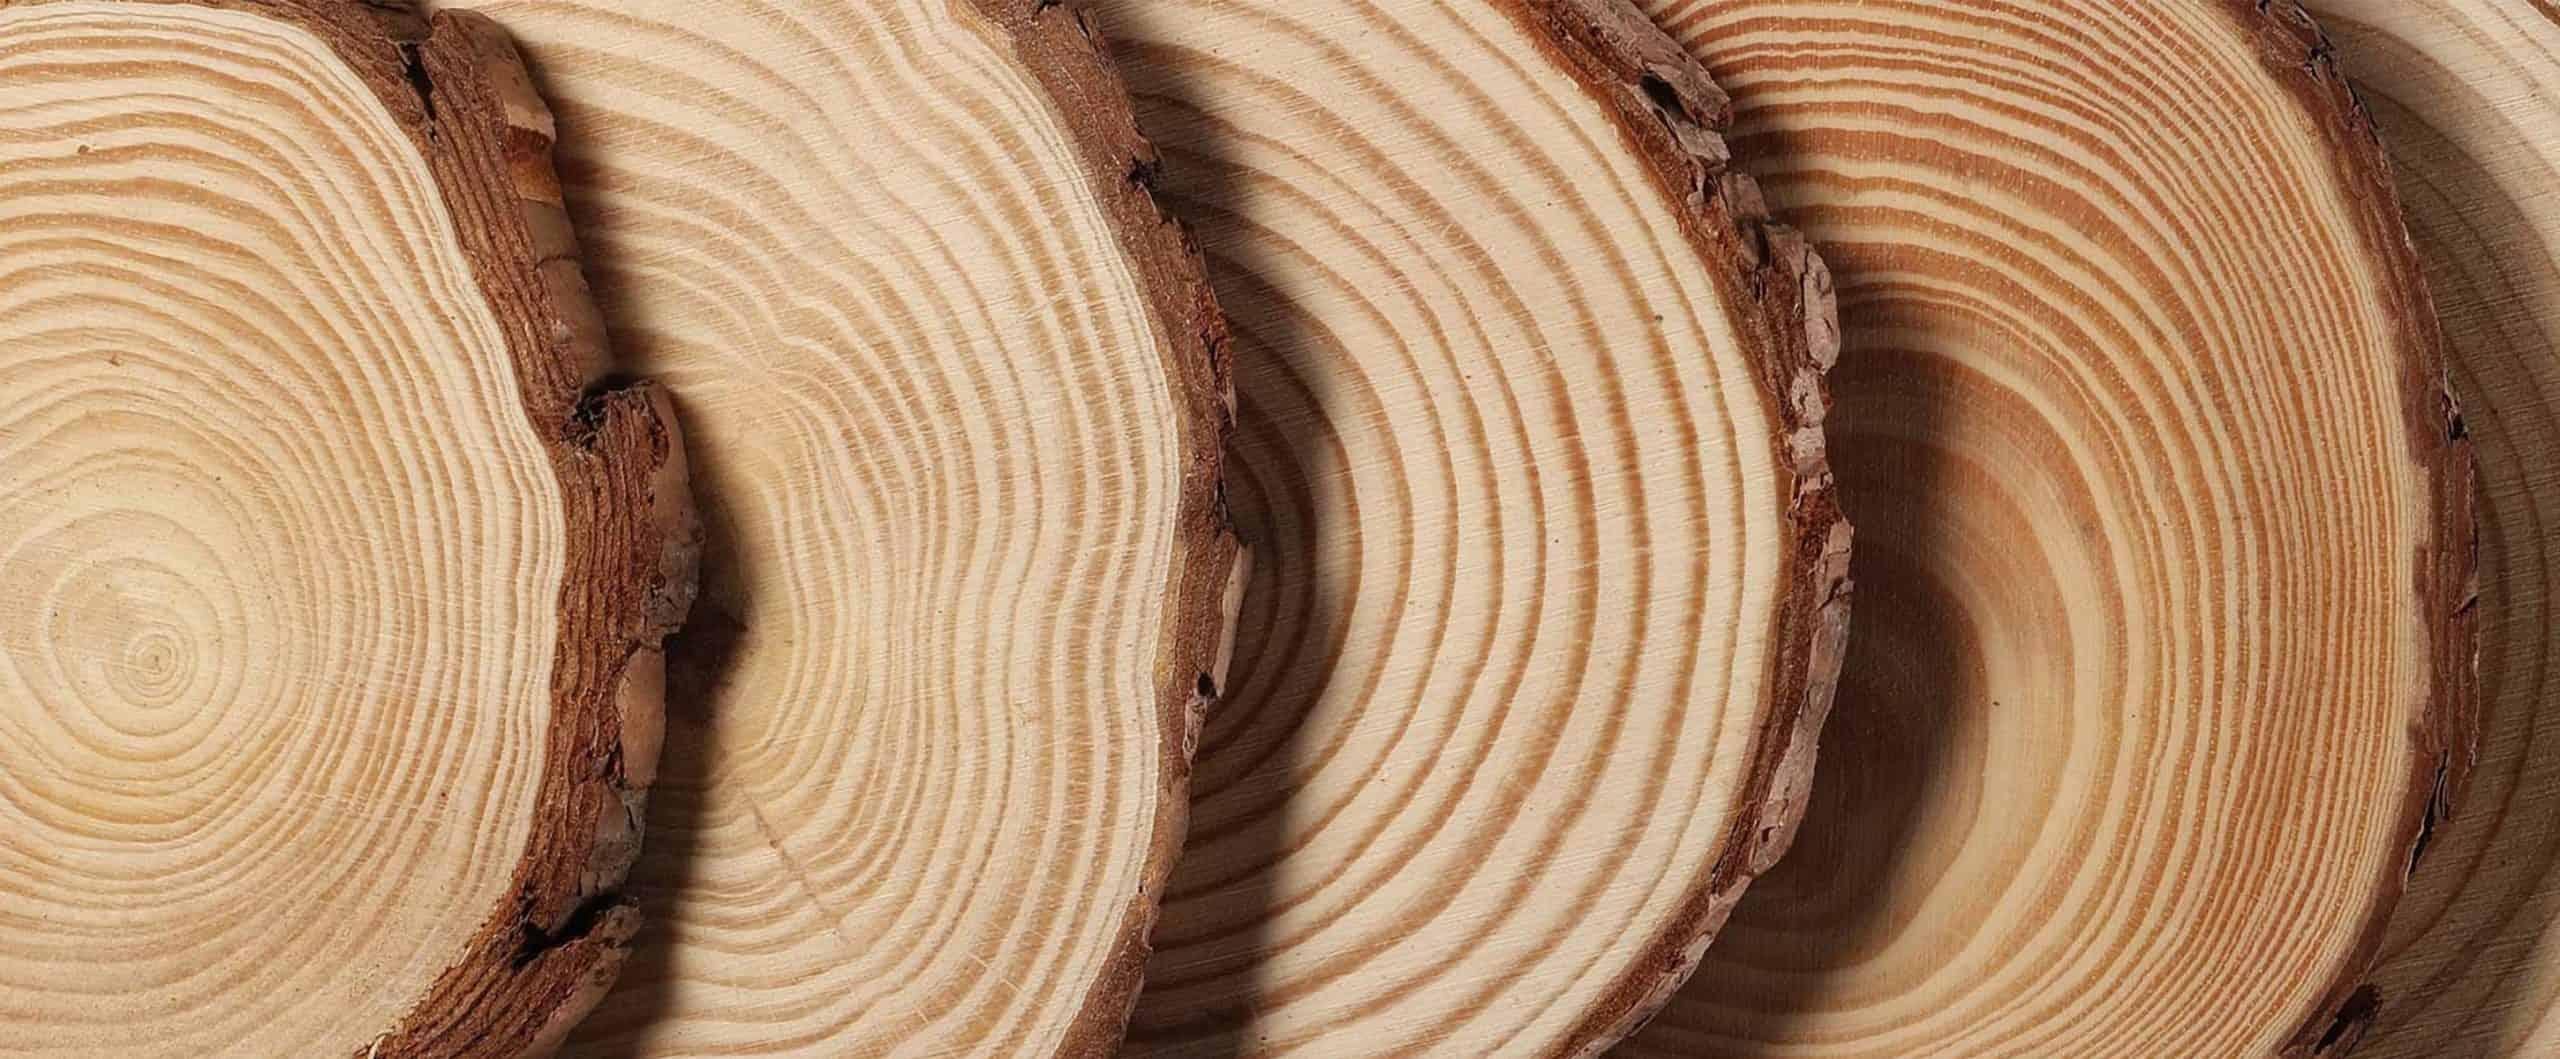 Bois chêne - WoodWorker Shop